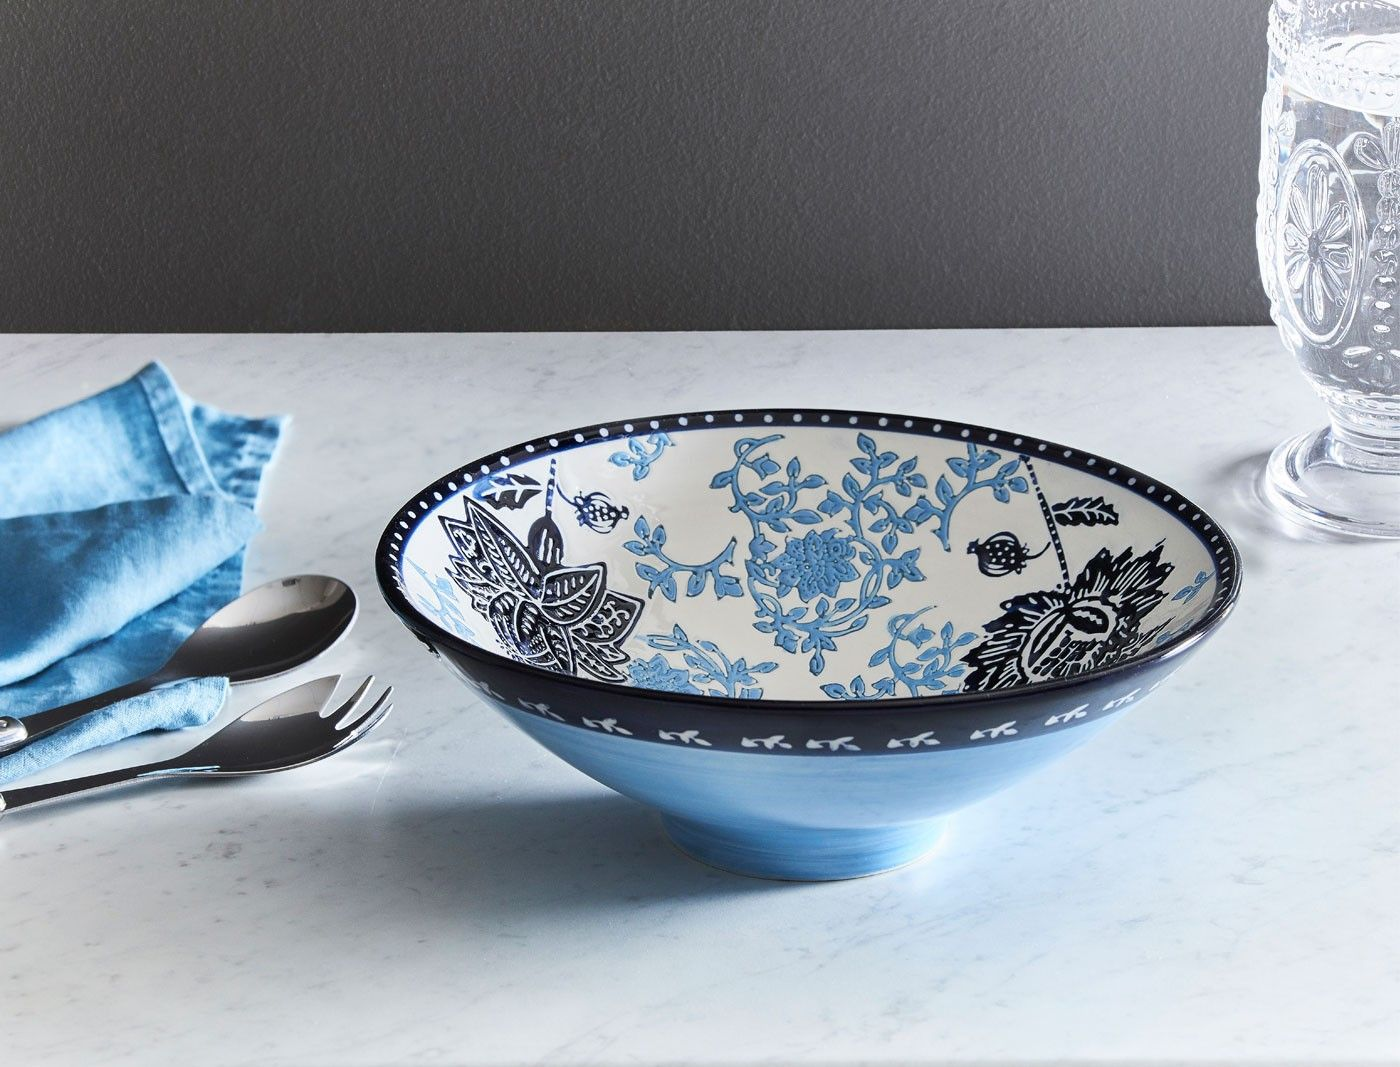 Tango Flared Bowl Blue Floral Blue X2f Ink Bowl Blue Ink Decorative Bowls